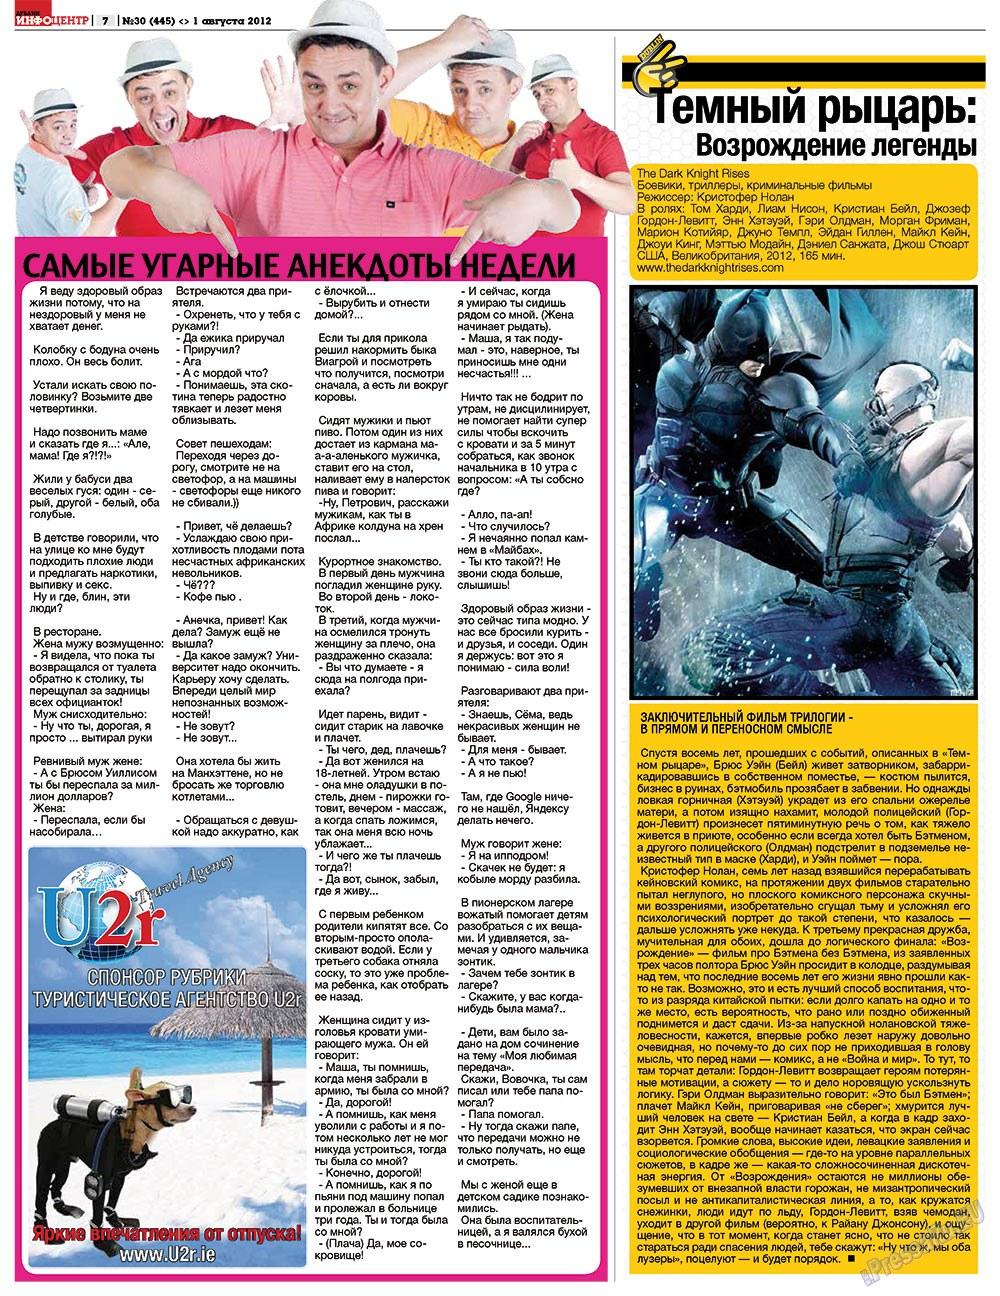 Дублин инфоцентр (газета). 2012 год, номер 30, стр. 7